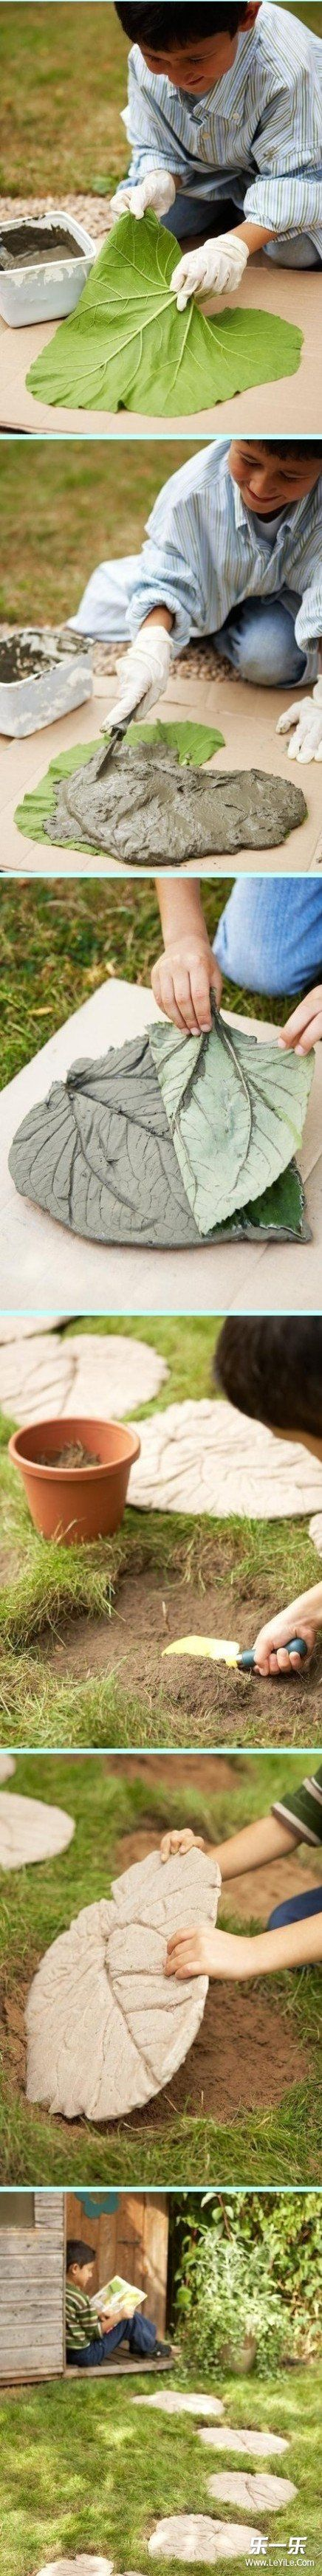 DIY Garden Path of Leaves by leyile.com from http://6let.ru/44-delaem-dorozhku-iz-listev.html: Lovely! #DIY #Garden_Path #Leaves